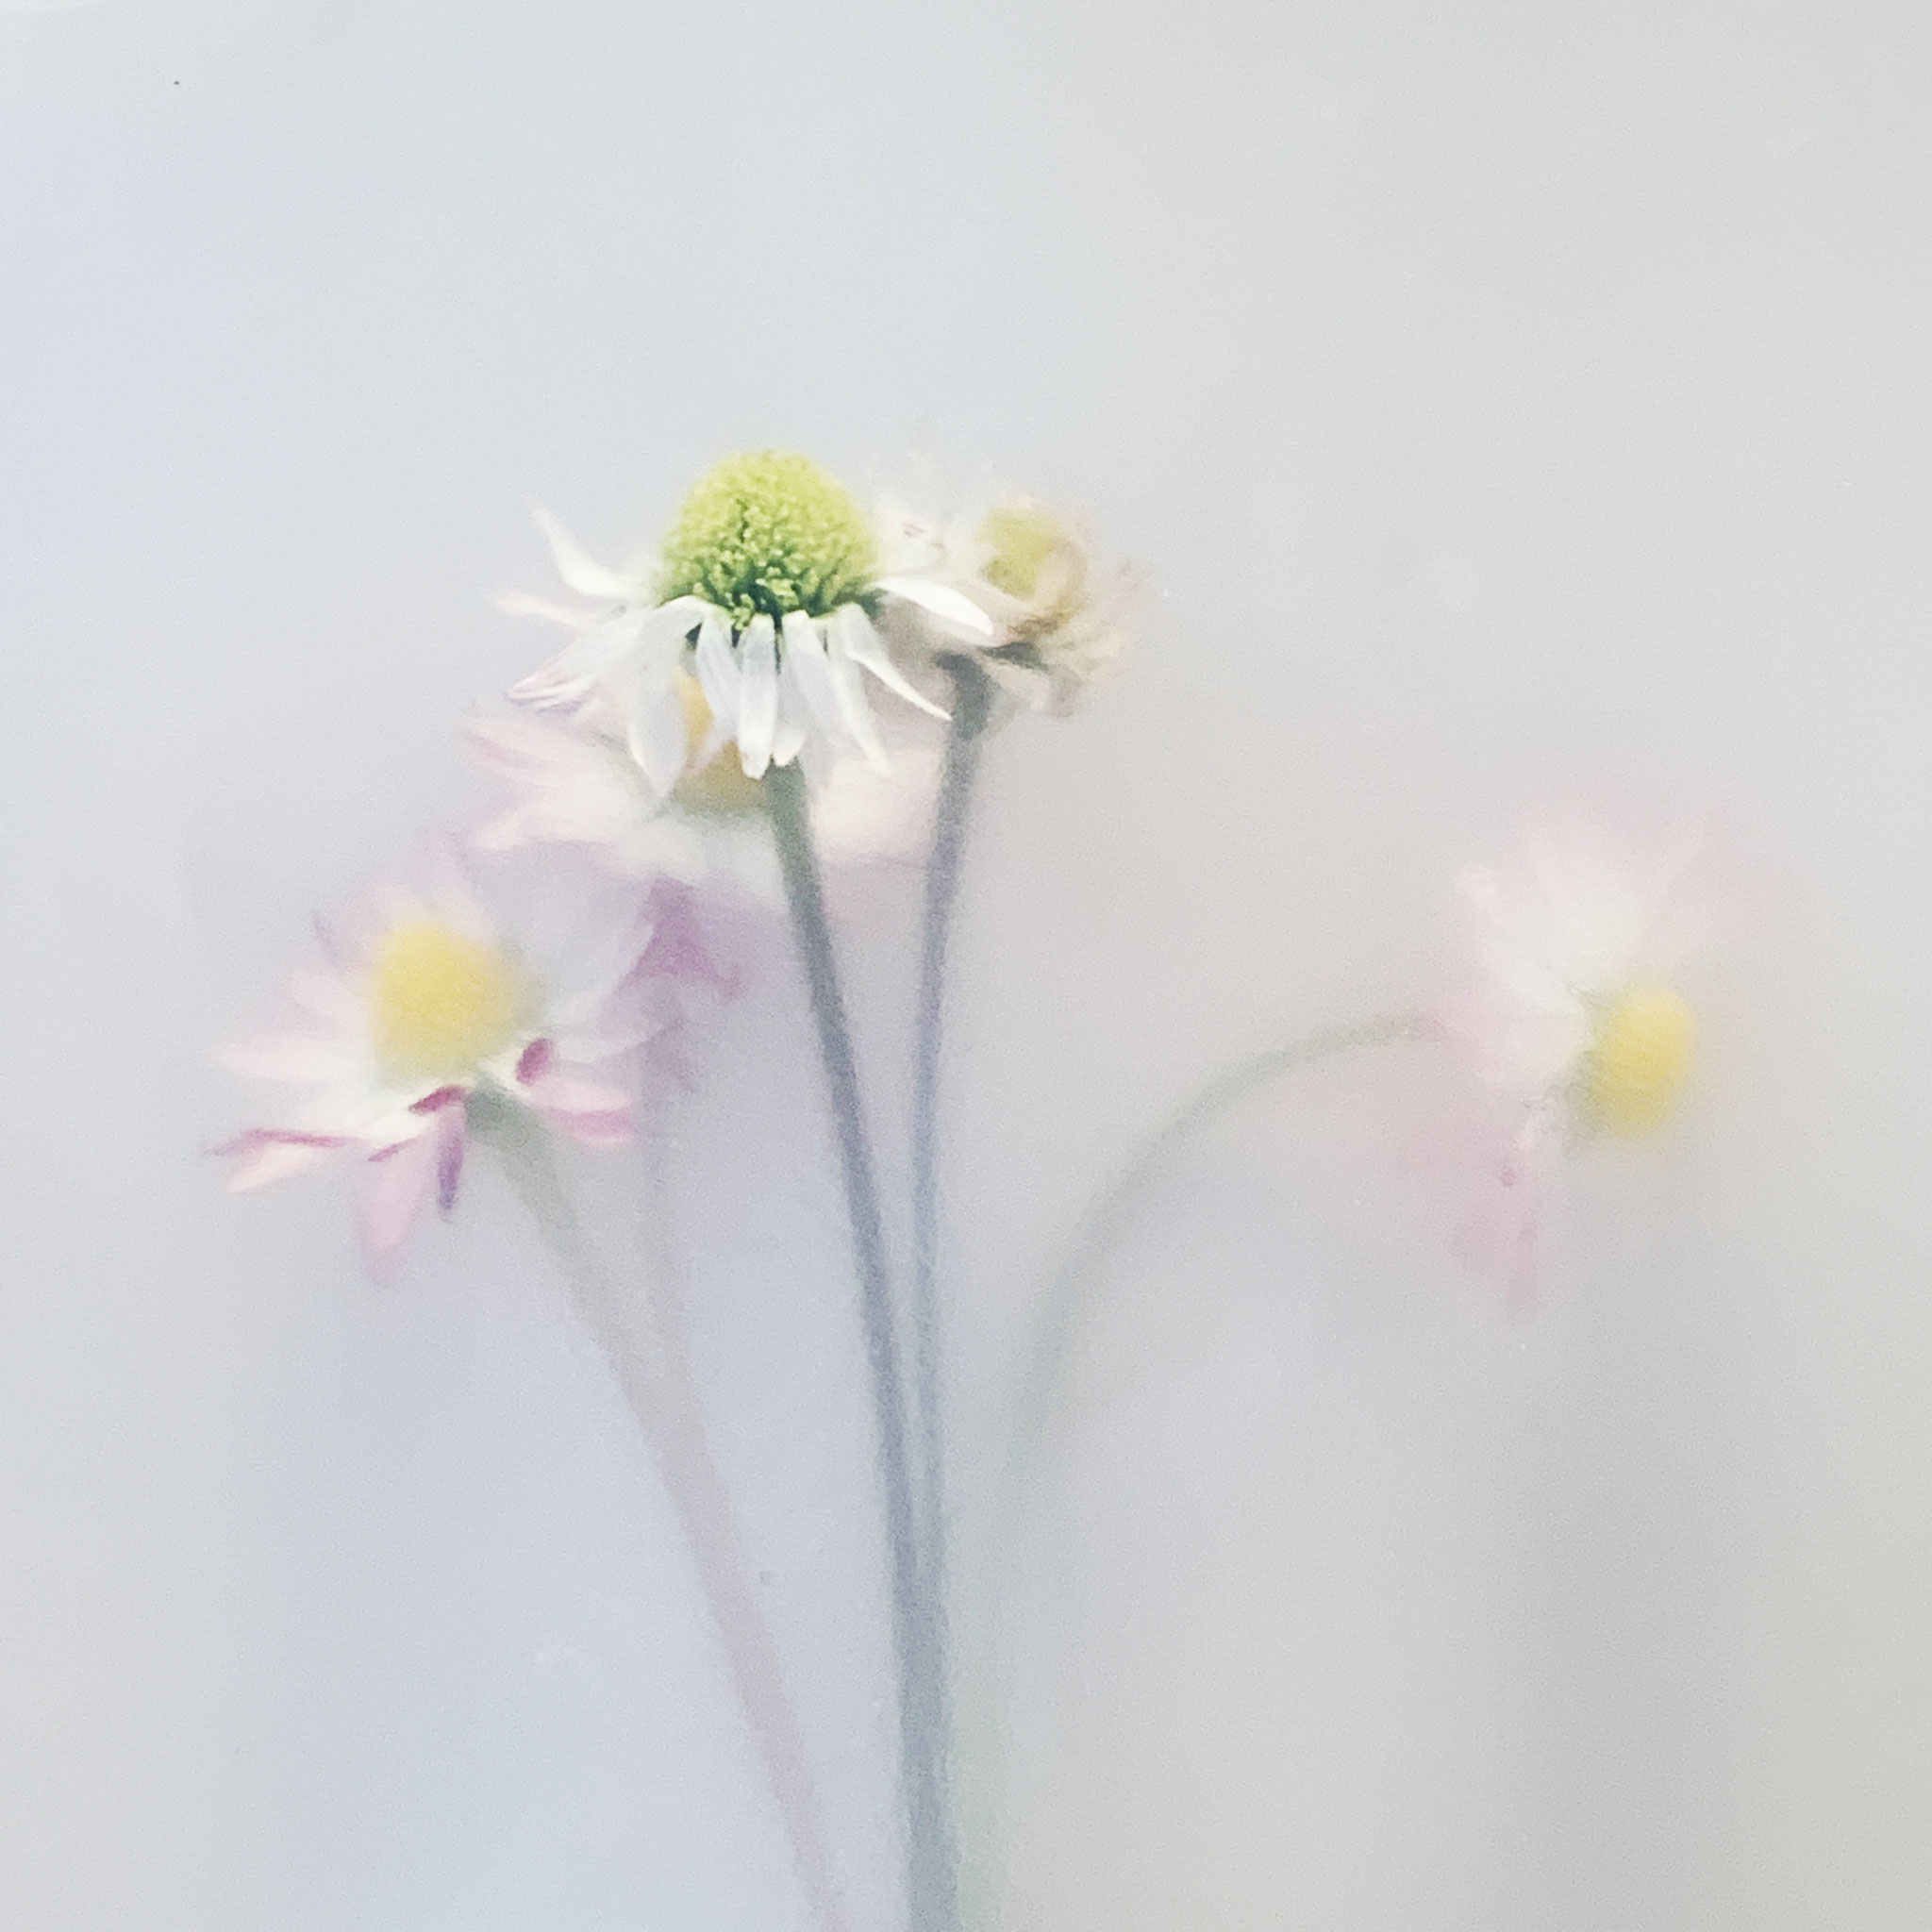 Wild Flowers (Fotografie)